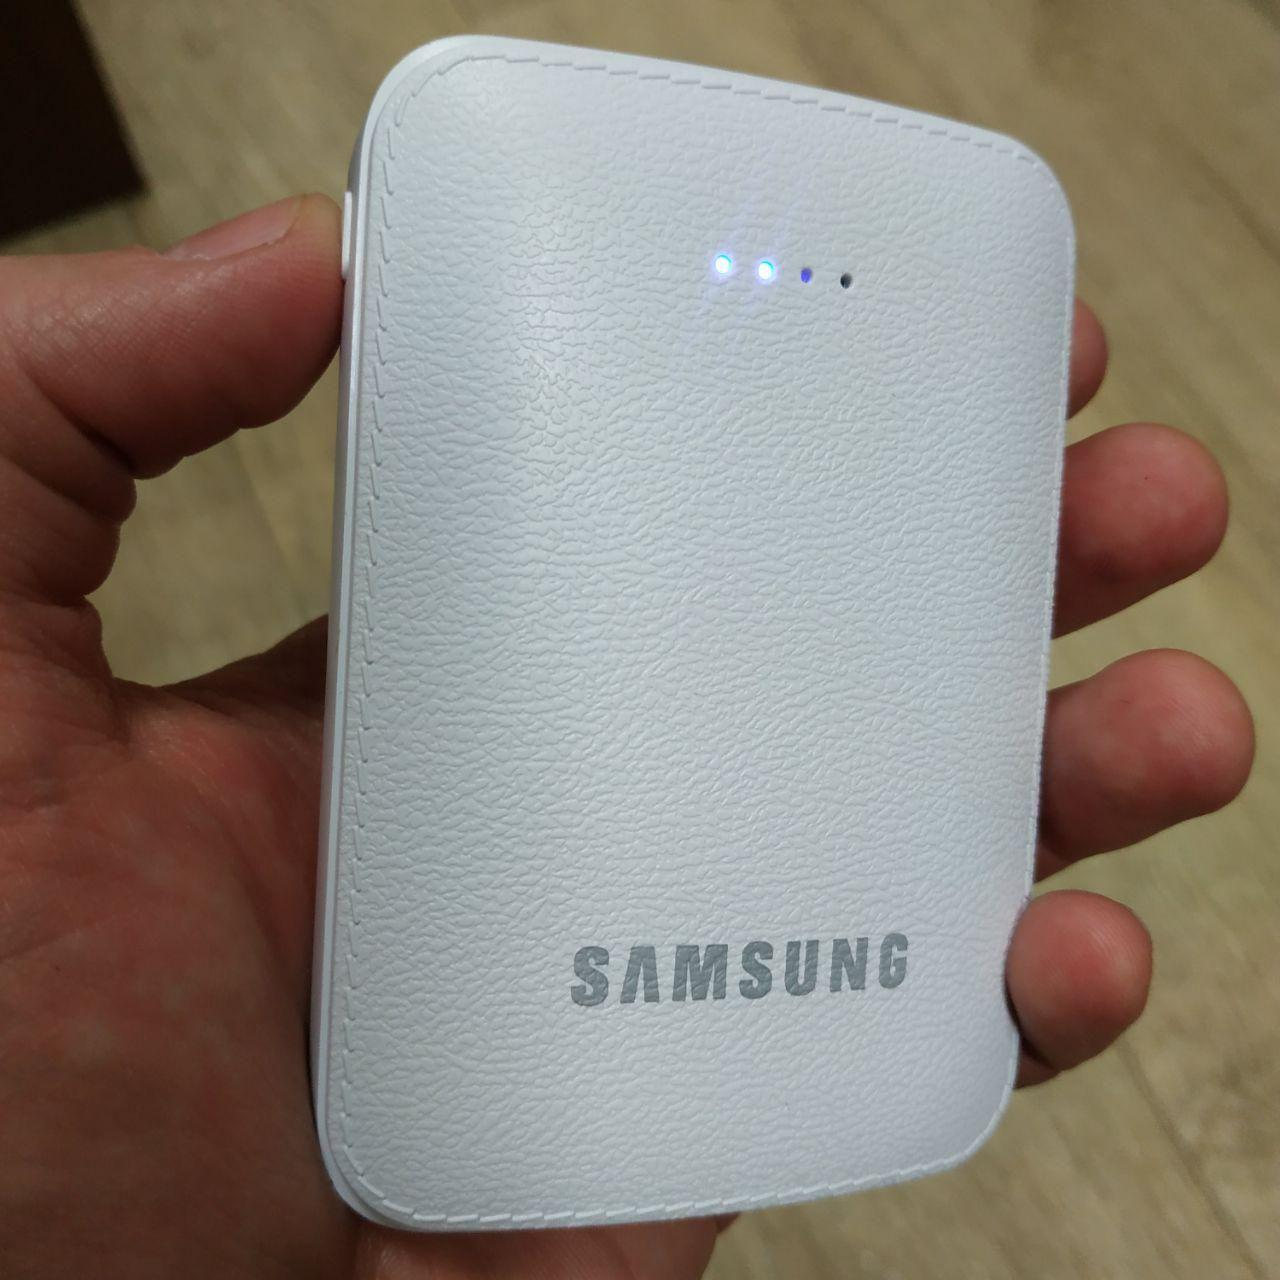 Power Bank Samsung 15000 mAh повер банк внешний аккумулятор Самсунг с фонариком реплика, фото 1